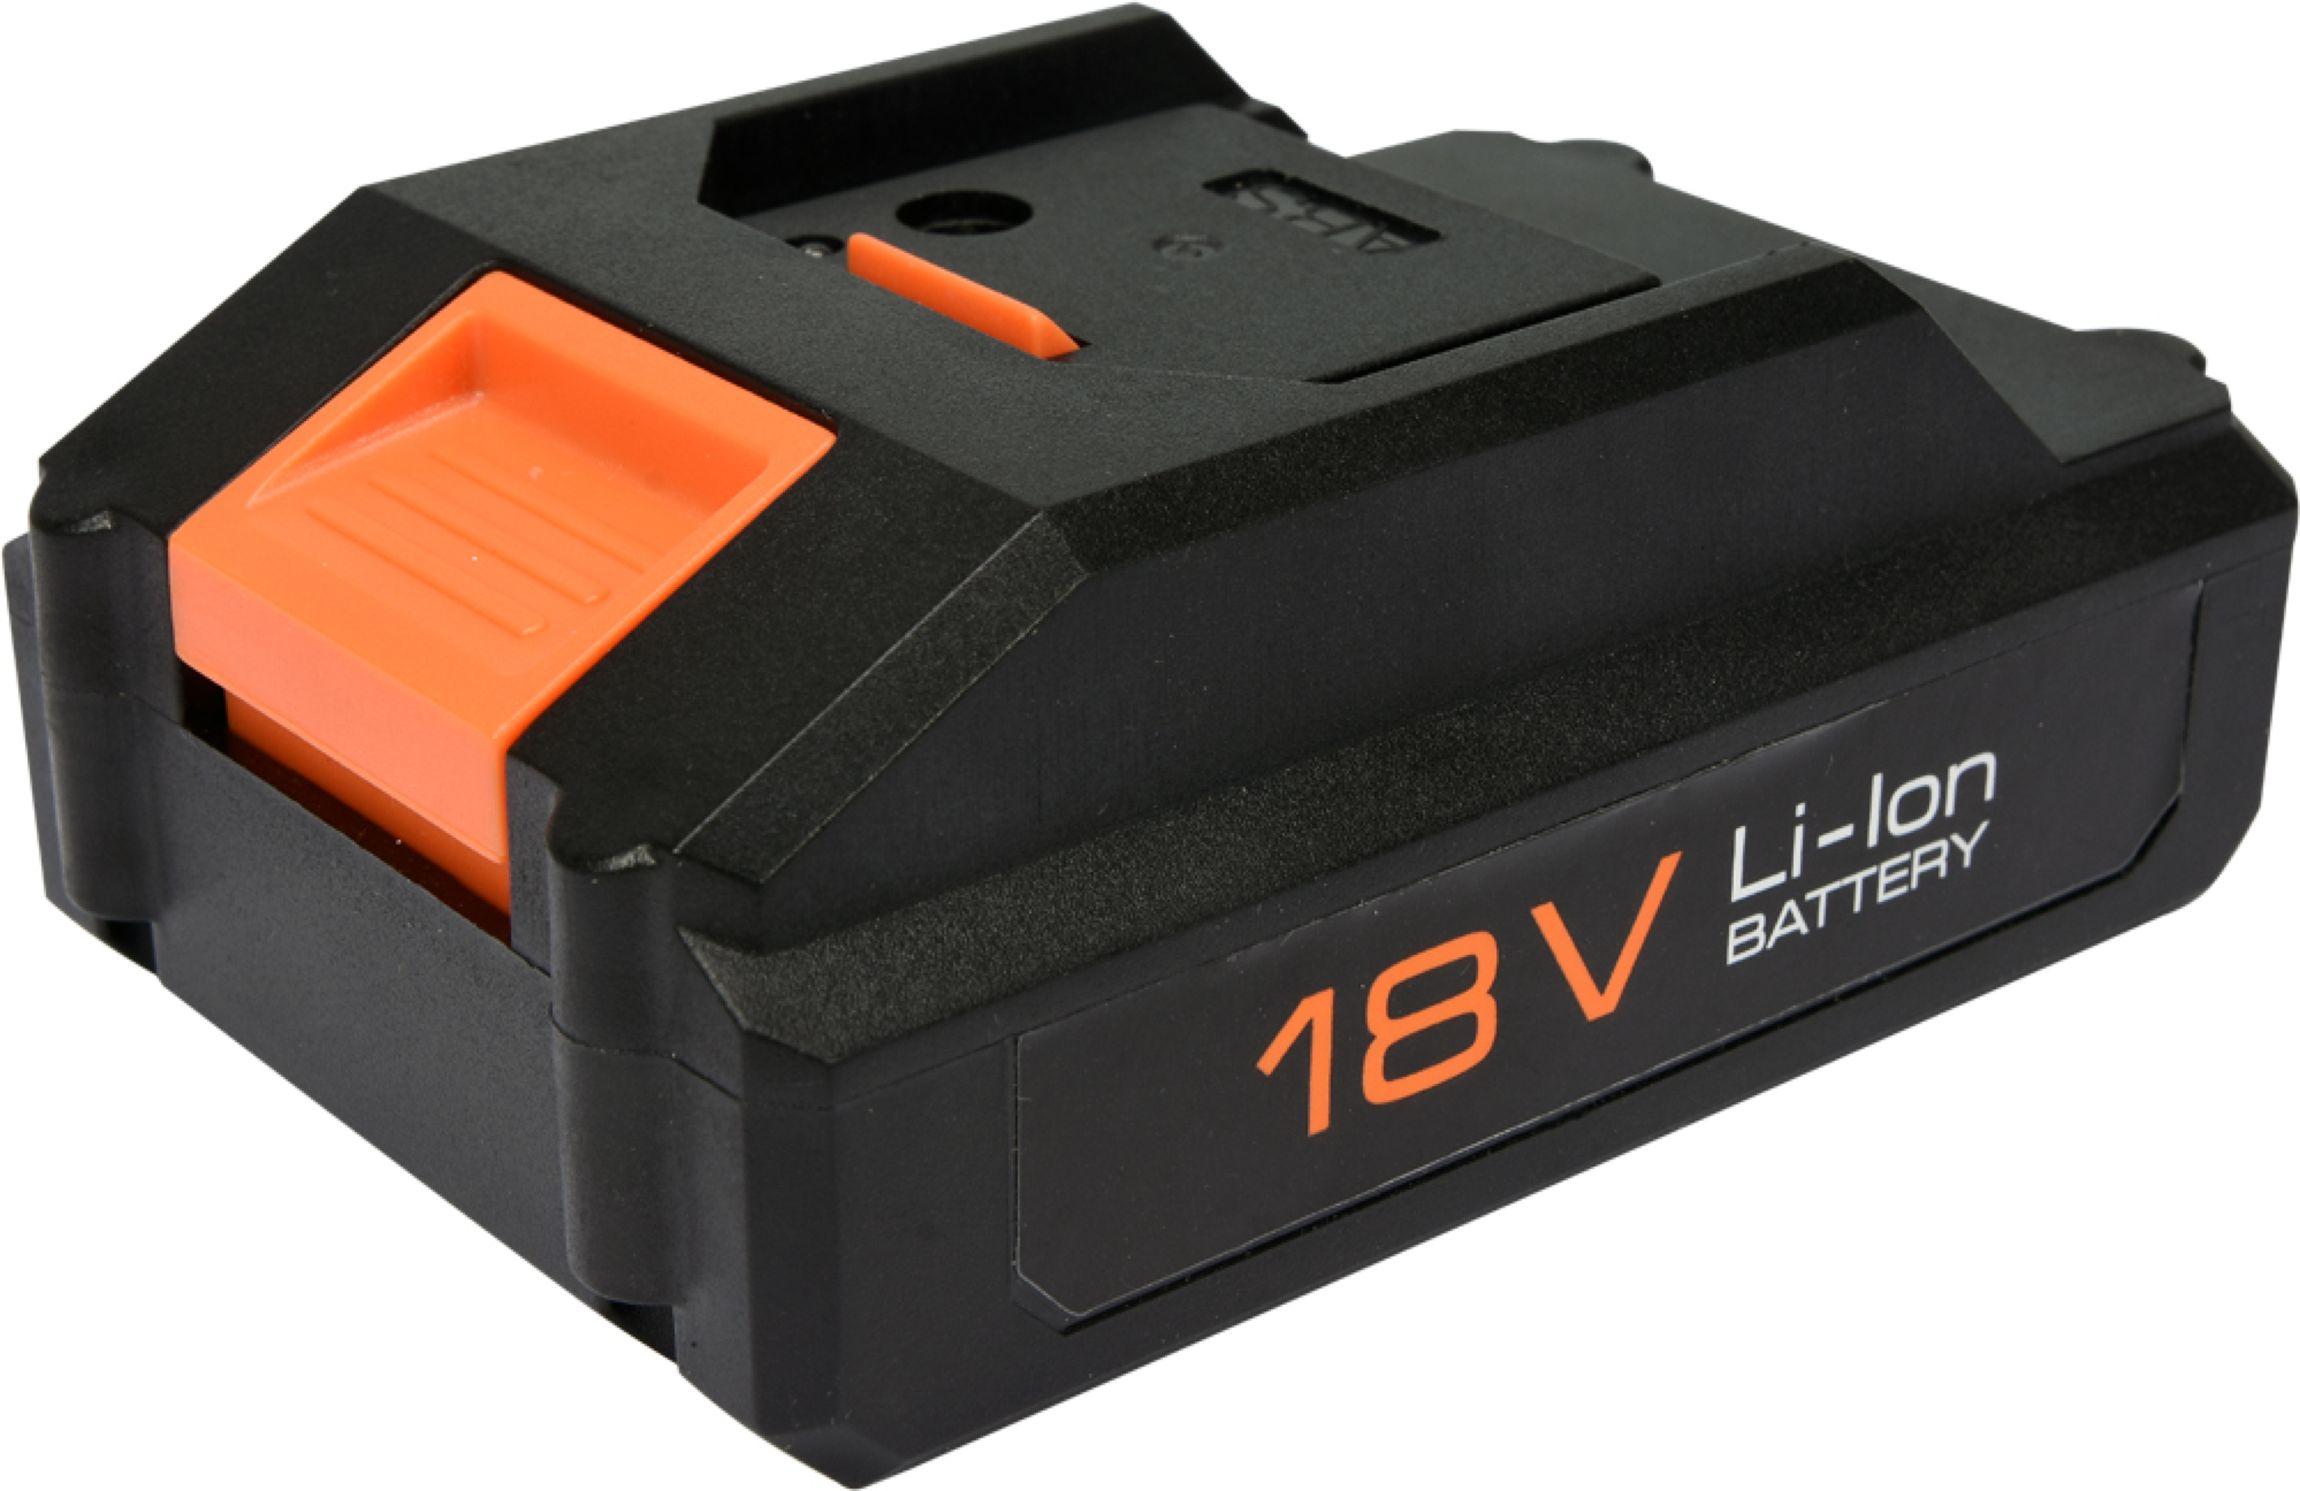 Baterie 18V LI-ION 1.3 Ah pro TO-78983